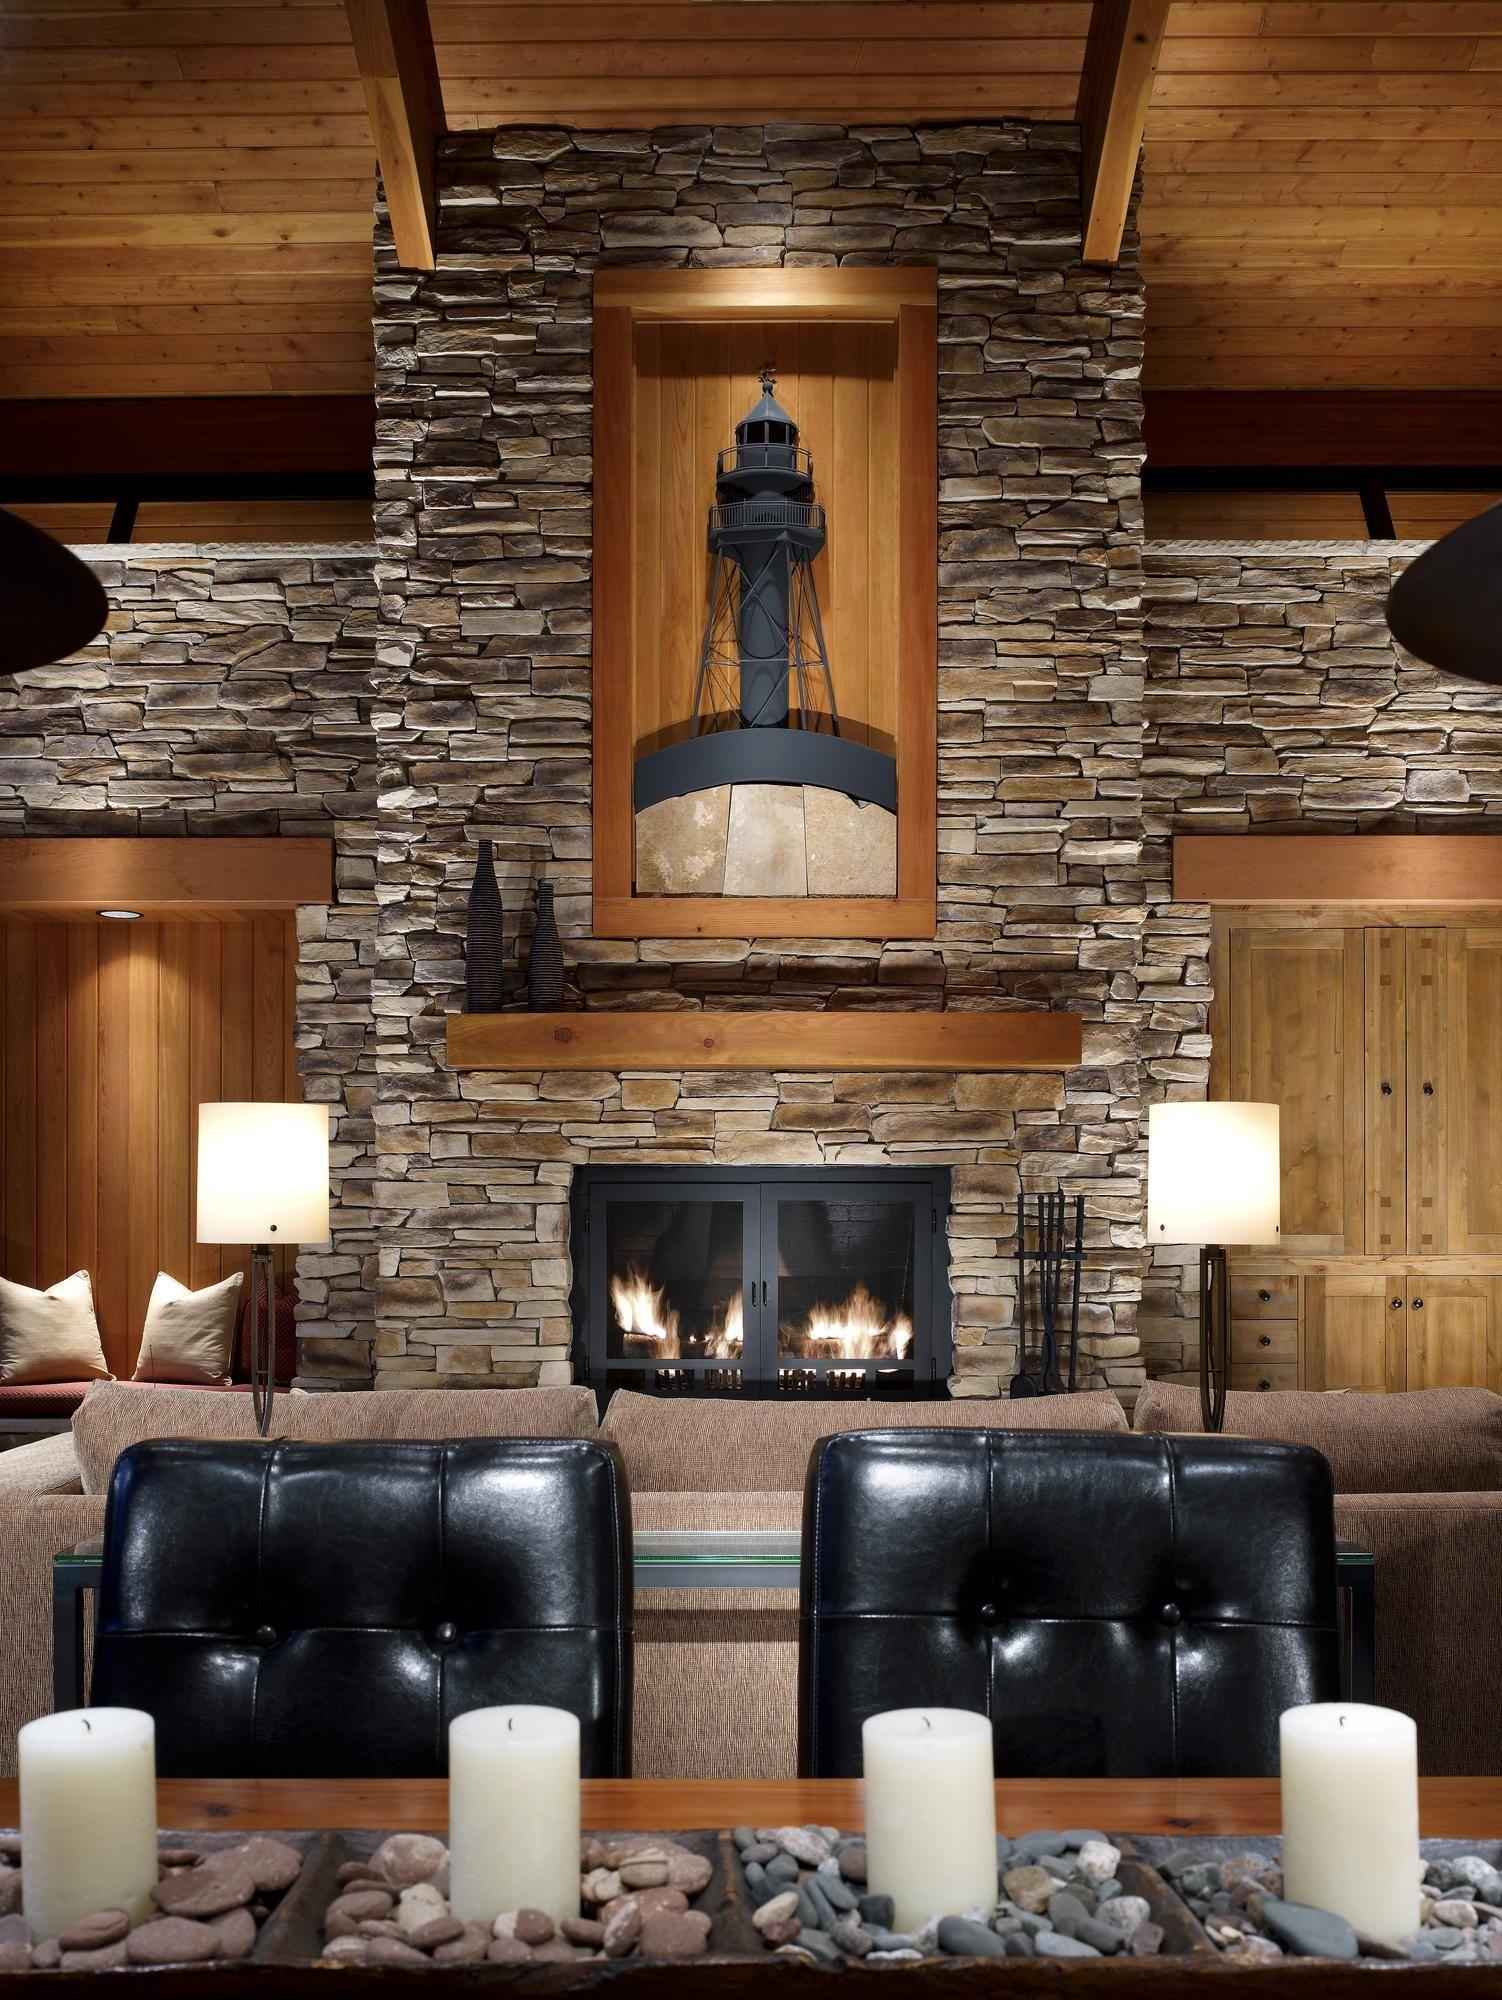 North Woods Cabin Eldorado Stone Fireplace Design Eldorado Stone Rustic Stone Fireplace